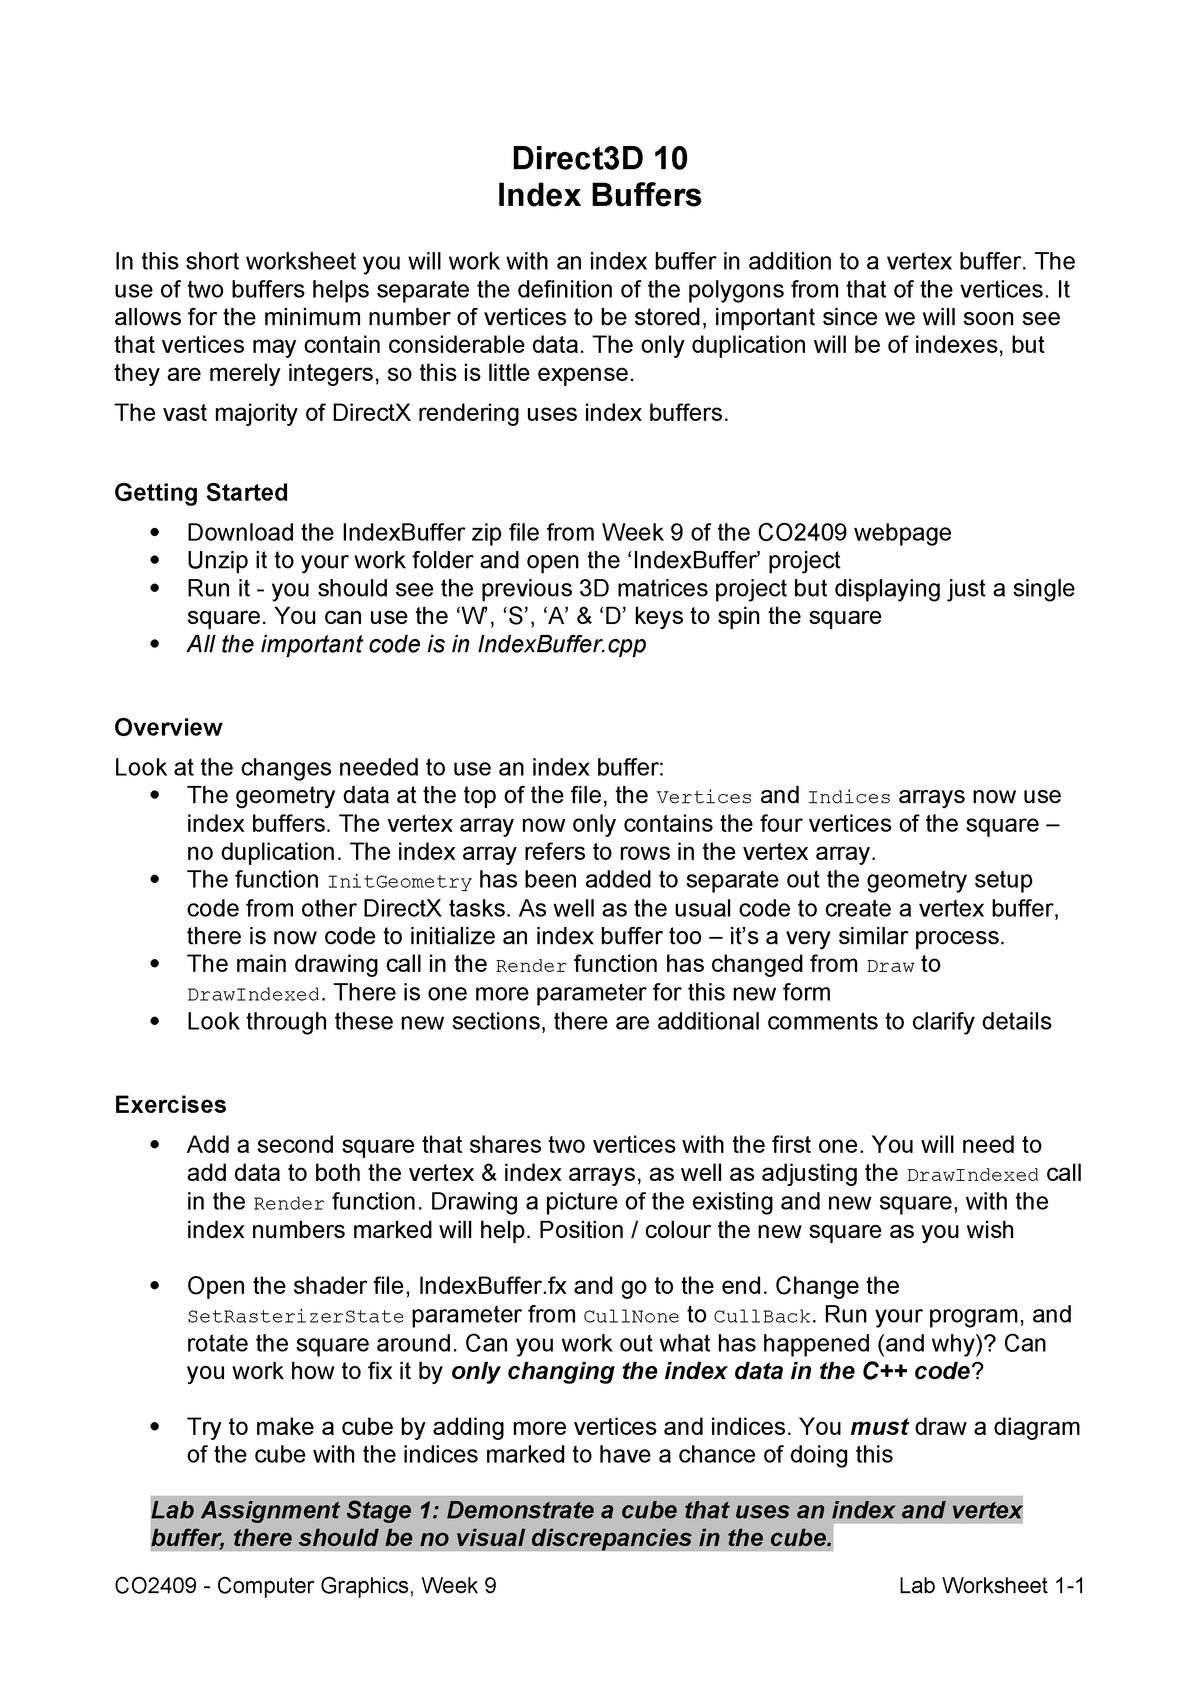 CO2409-9 Lab Worksheet - Computer Graphics - StuDocu